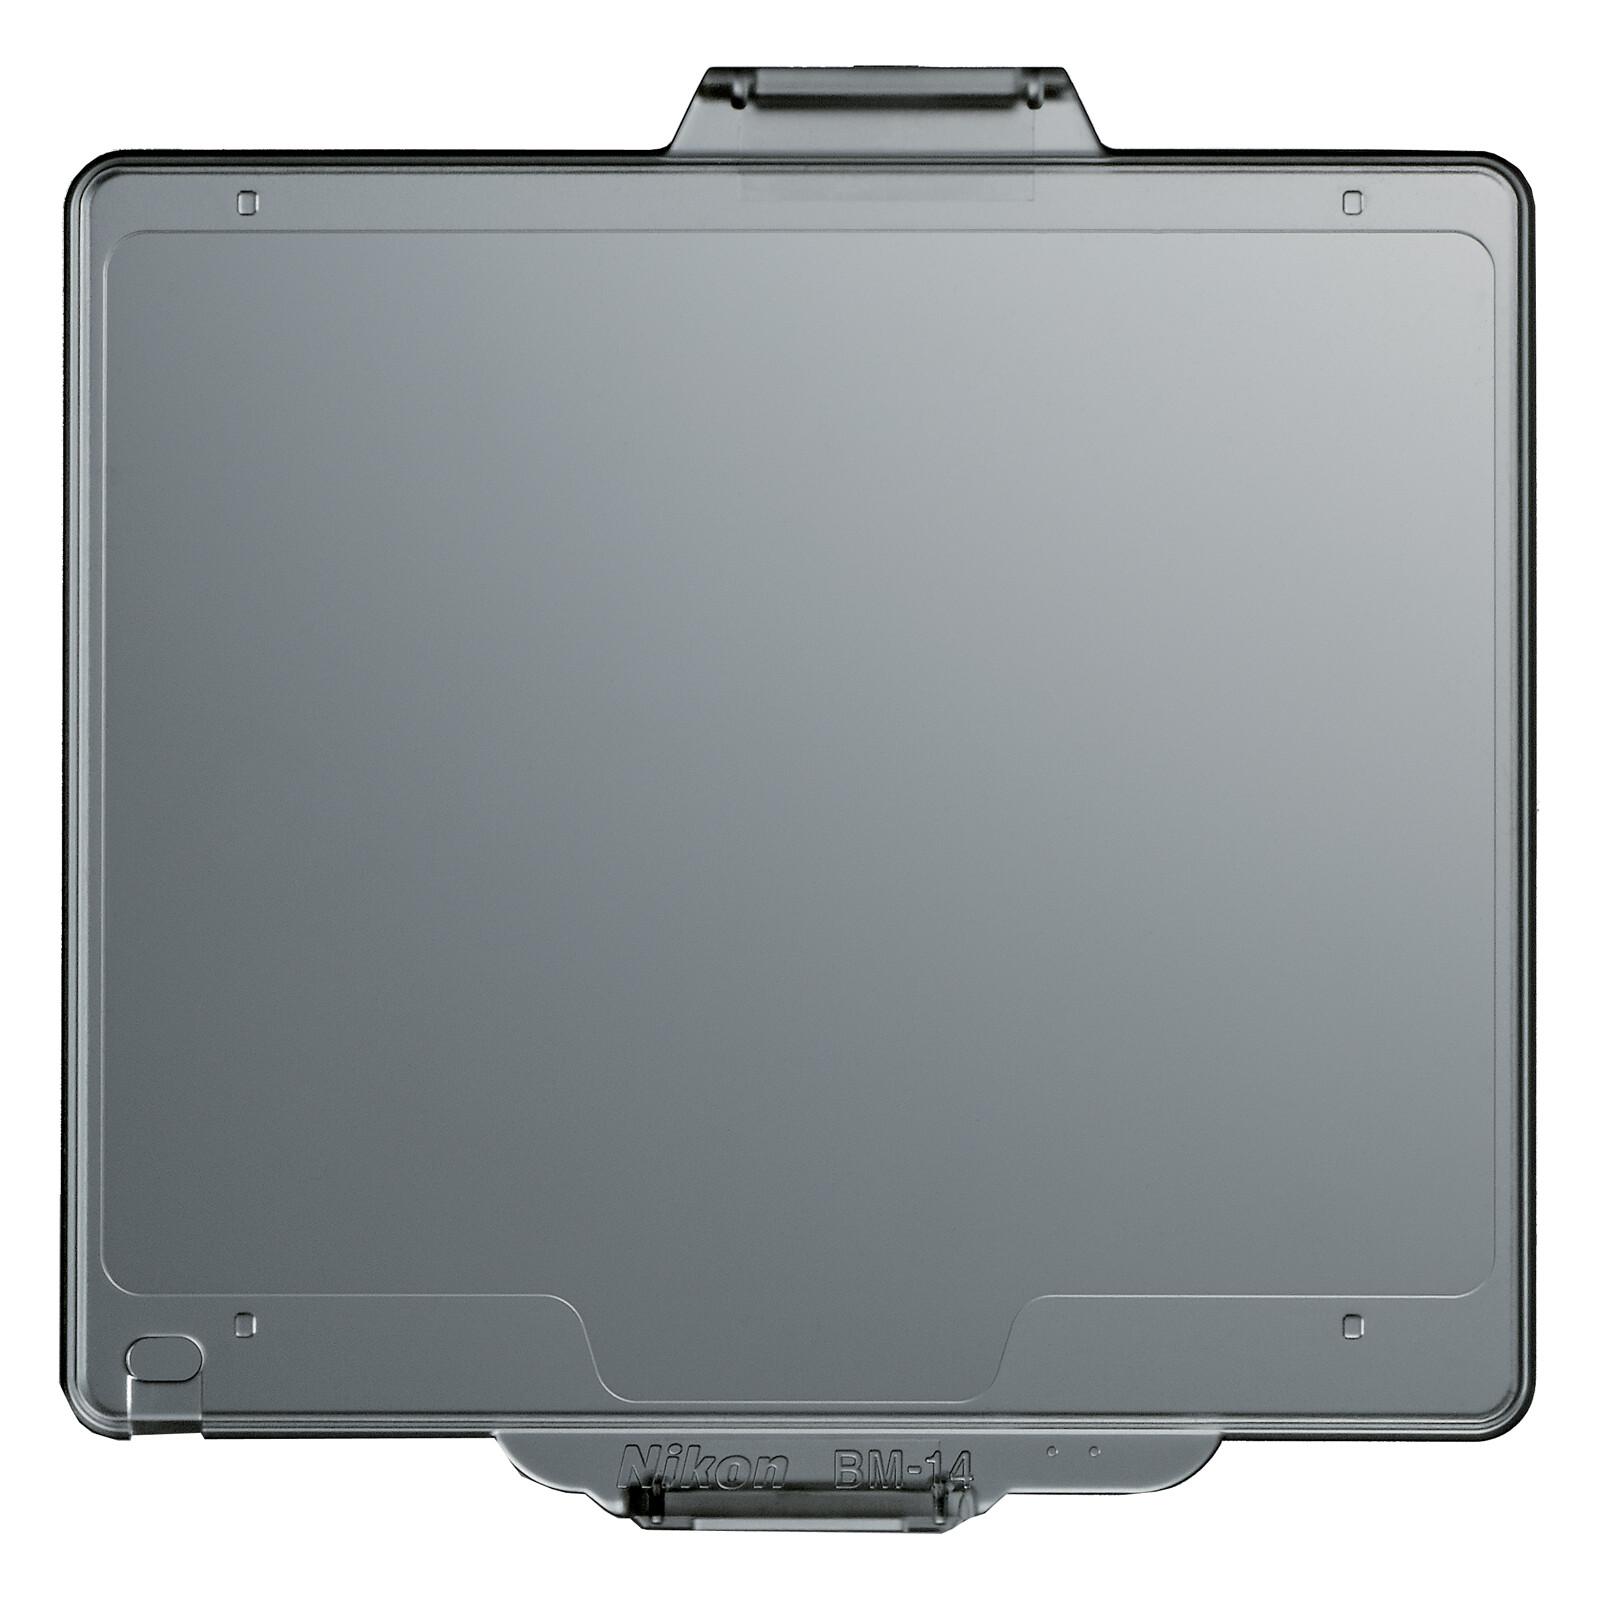 Nikon BM-14 Monitorabdeckung